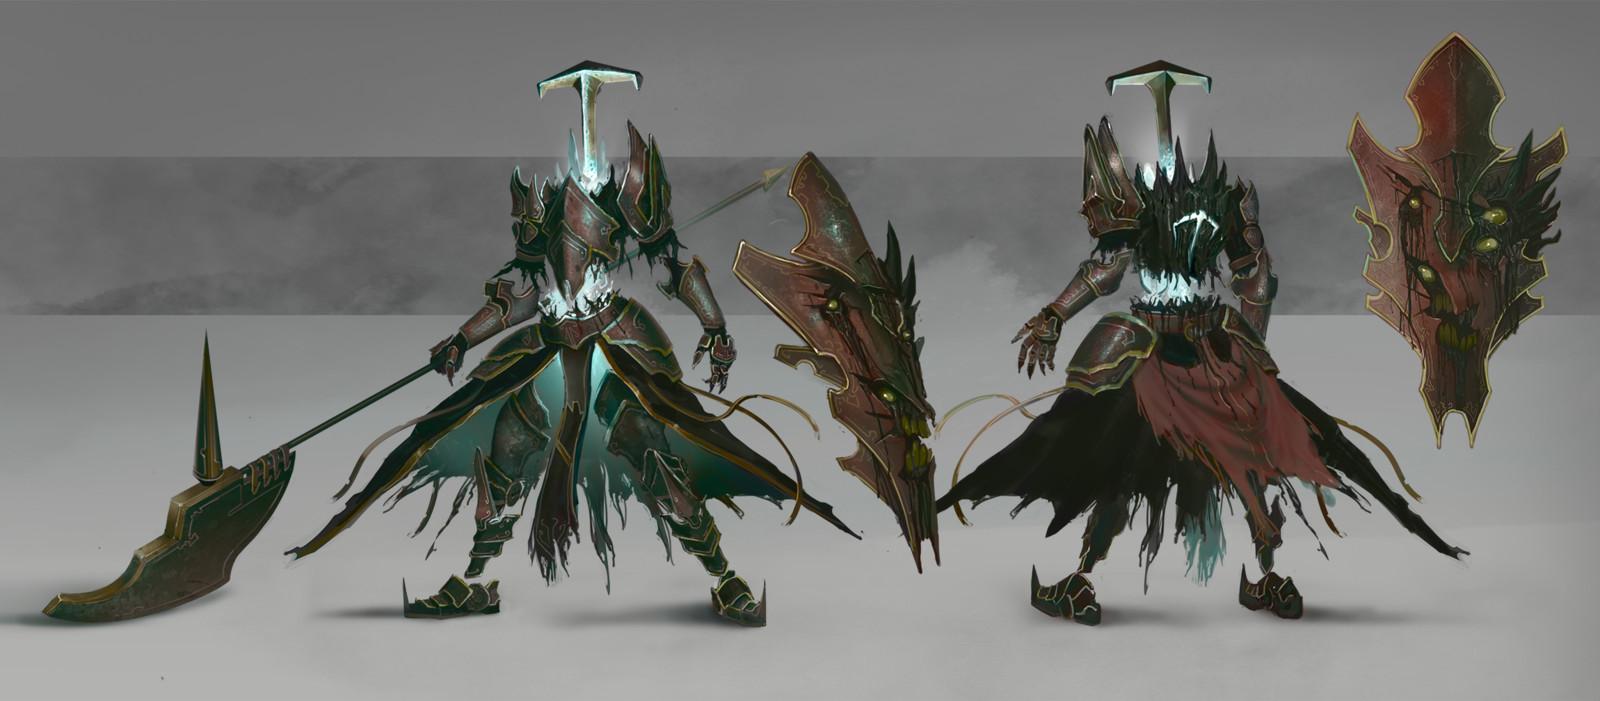 Possessed Armor Enemy